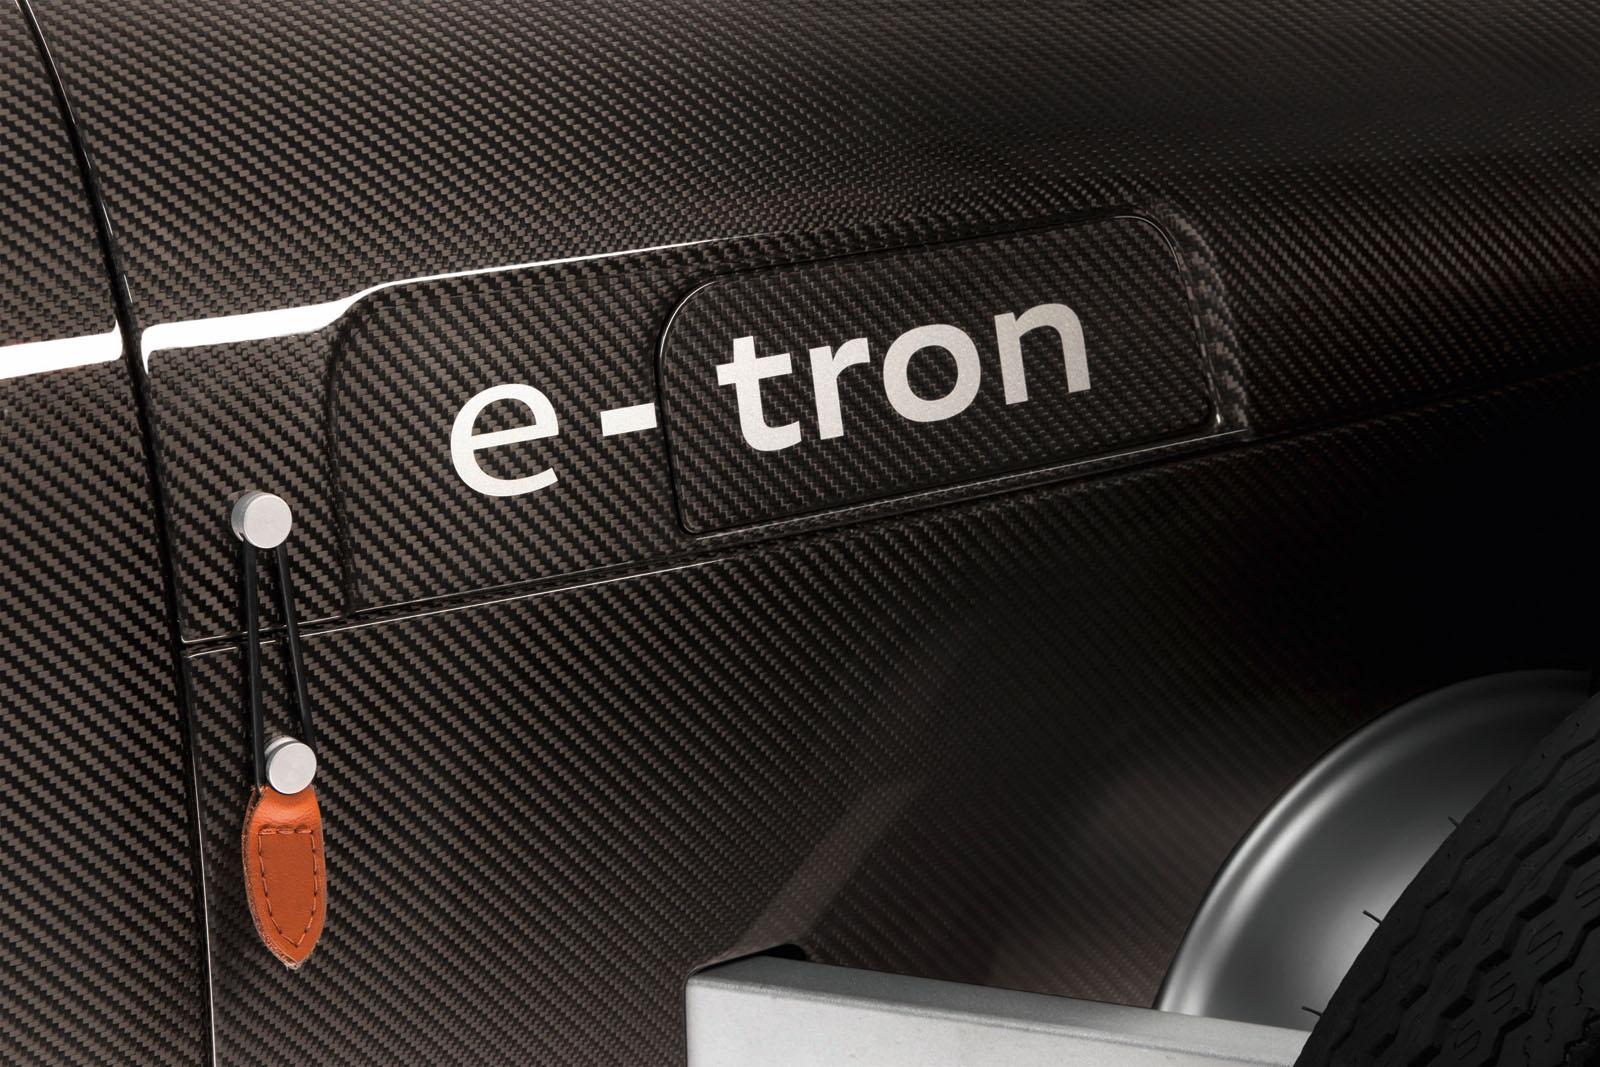 1295608920_audi2be-tron2bscale2bmodel2b5 Масштабная игрушка от Audi – Auto Union Type C e-tron!